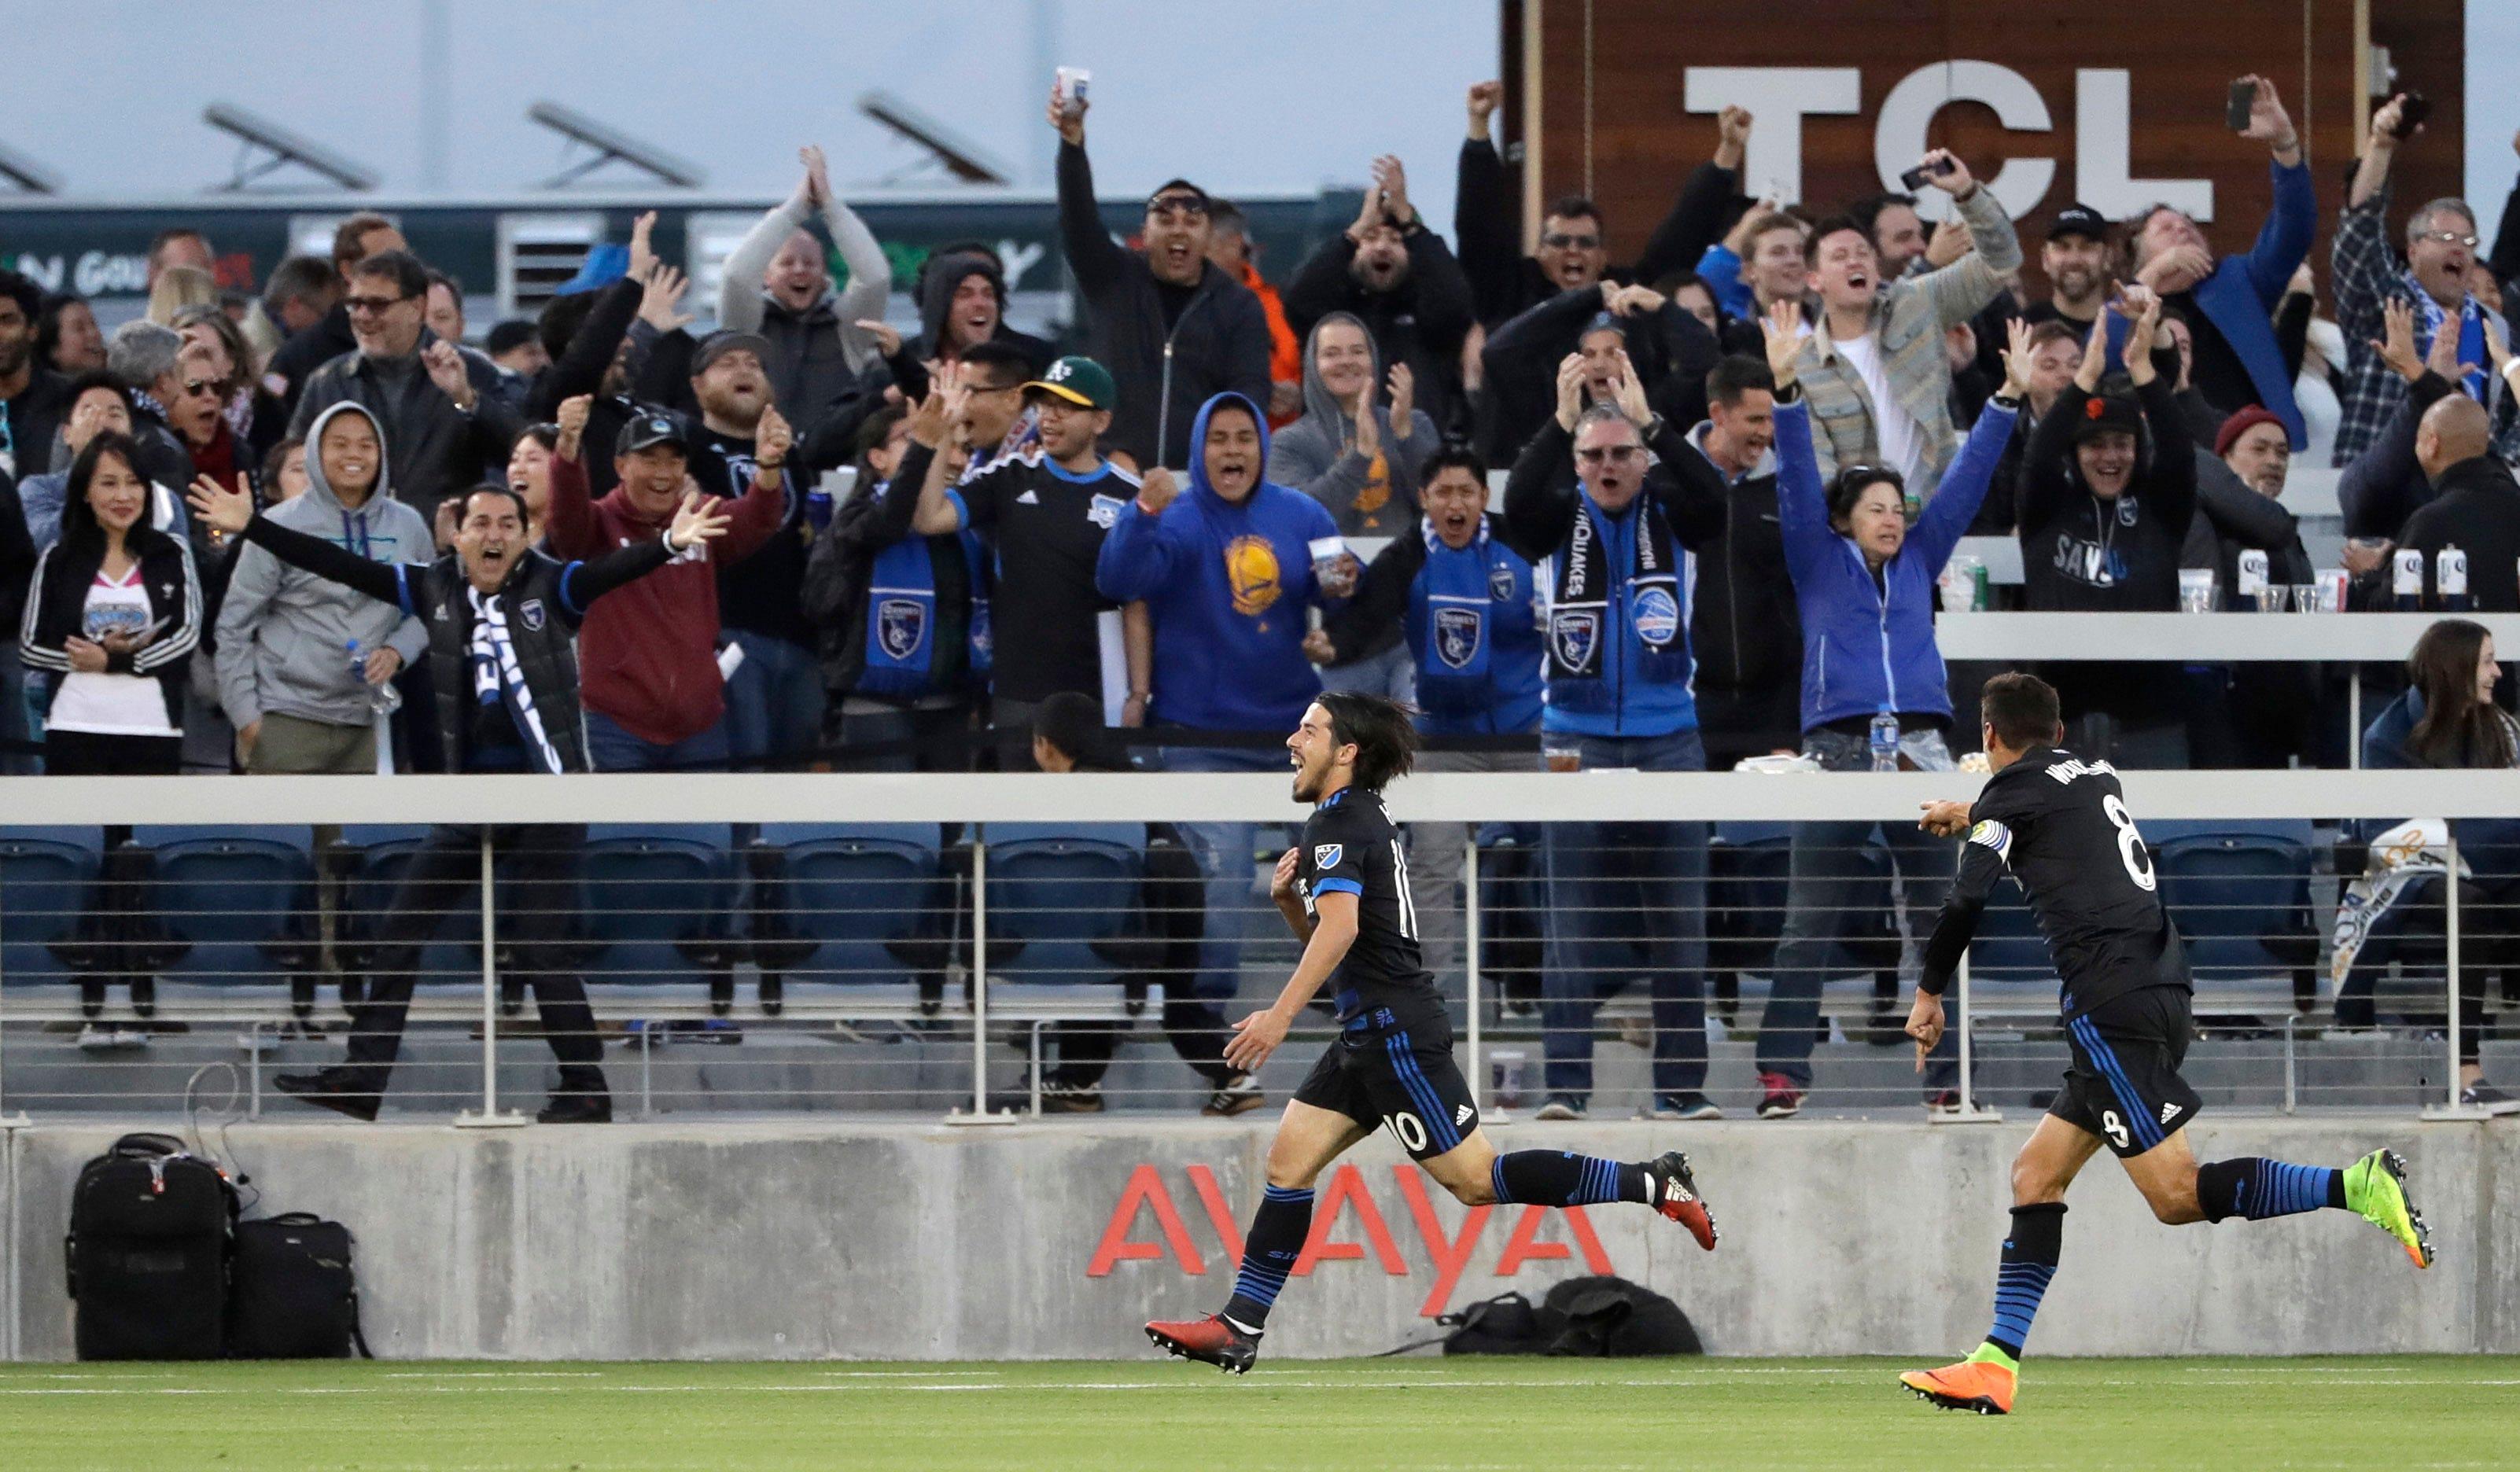 Wondolowski reaches 125 goals as Earthquakes top Timbers 3-0